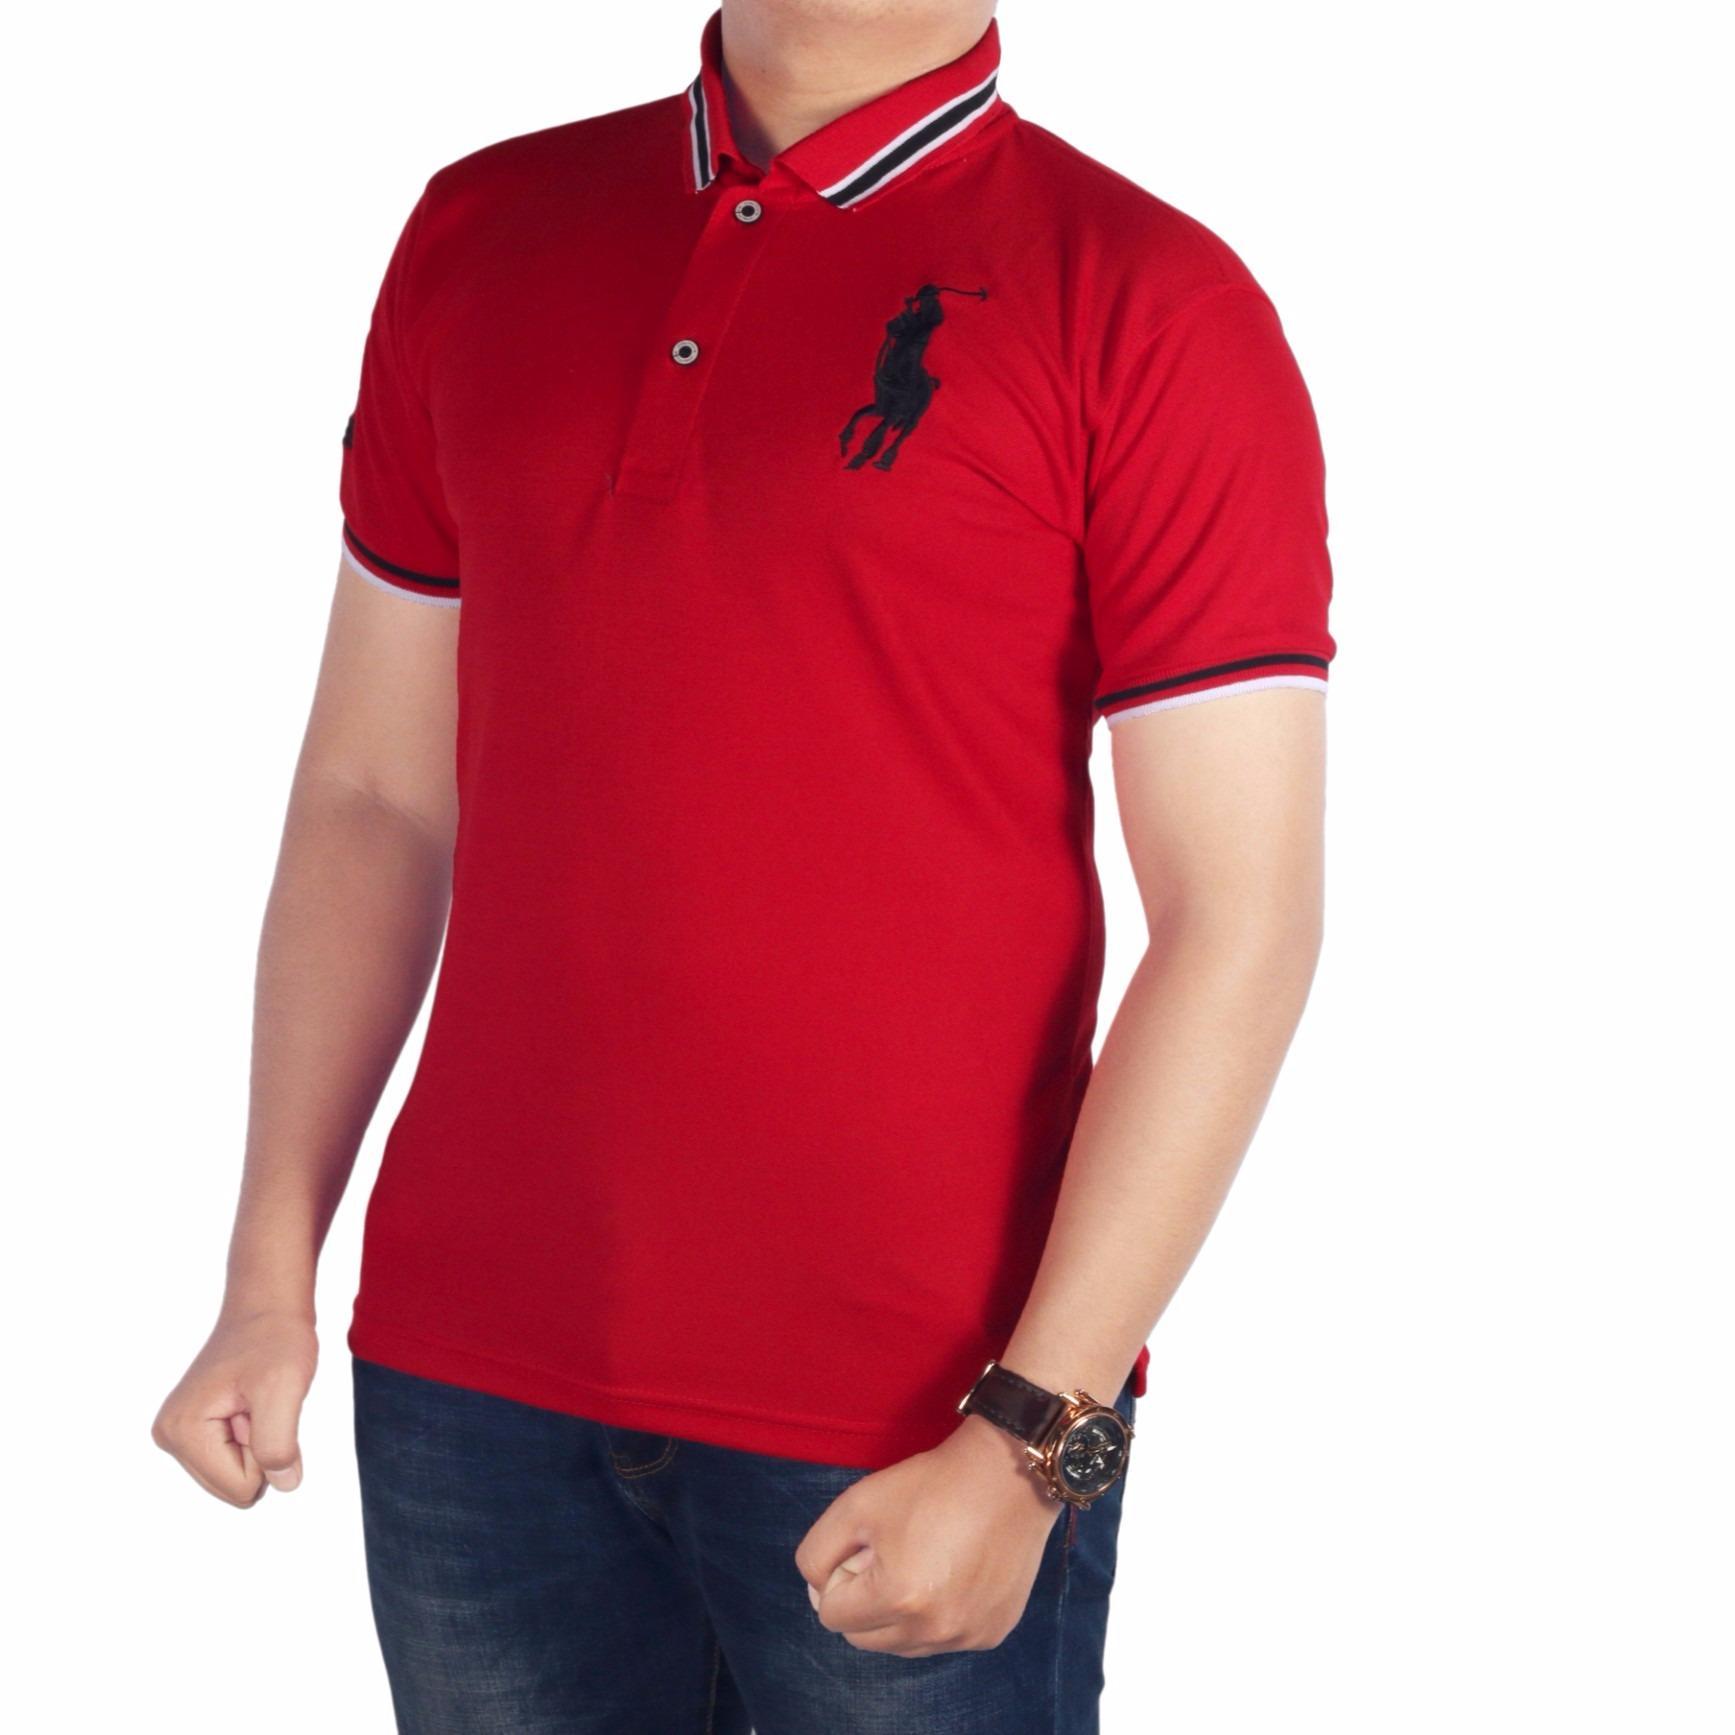 Dgm_Fashion1 Baju Kaos Polo Polos/kaos pria berkerah/ Kaos Polo Kerah Sanghai/Polo Kerah/Kaos Polo Pria Kerah Sanghai/Kaos Polo Pria Sanghai KombinasiKaos PoloShirt Pria/Polo men/Kaos Polo/Polo Kaos/Kaos Polo Six IP 4544 Merah